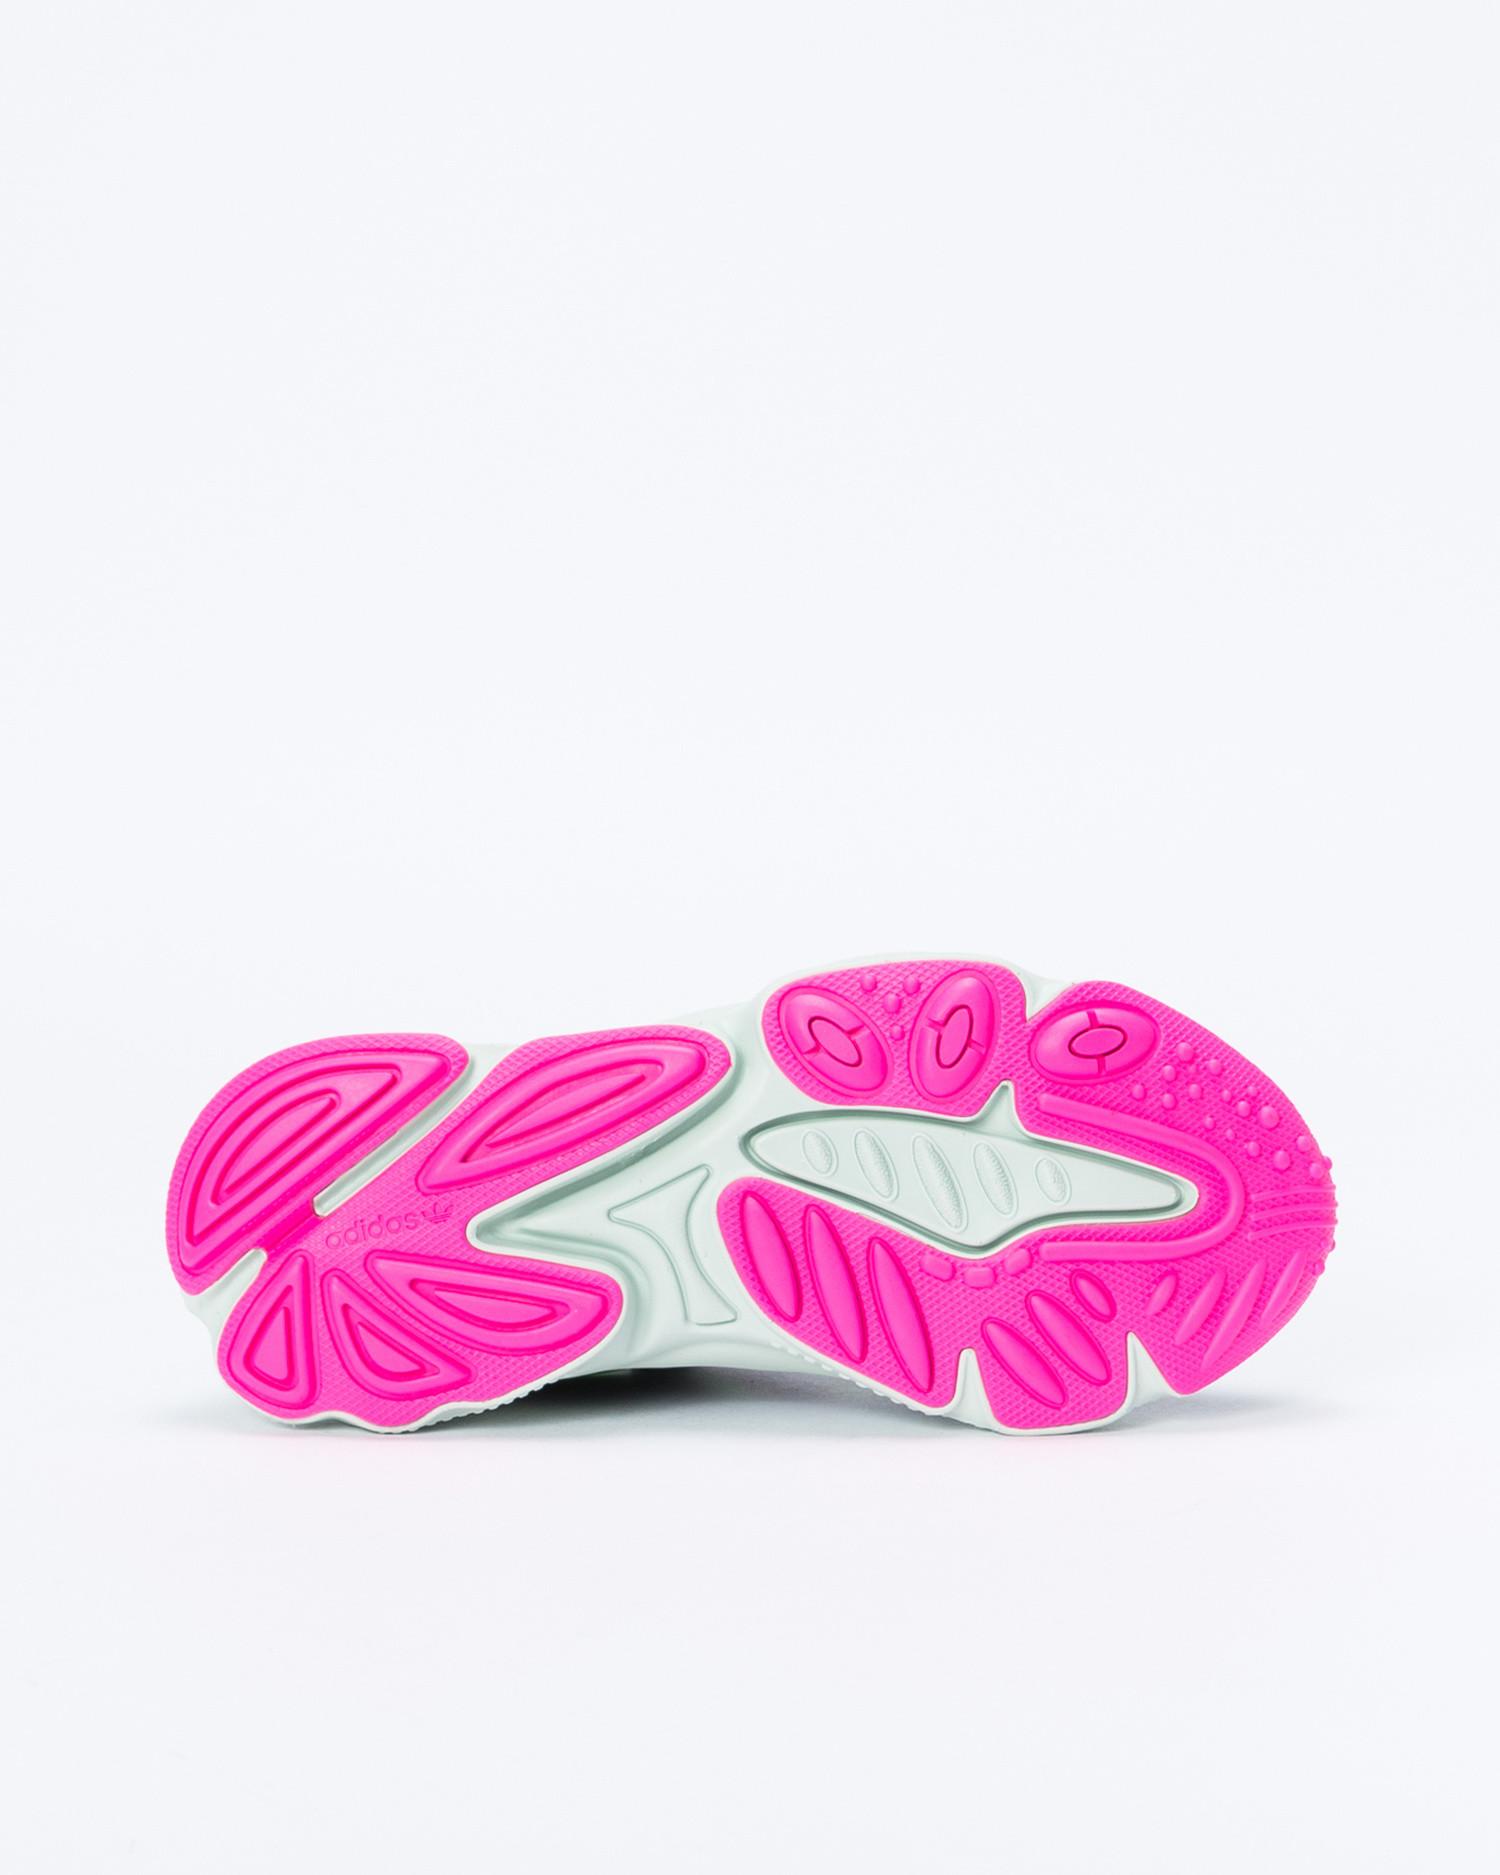 Adidas Ozweego w Core Black/Shock Lime/Shock Pink